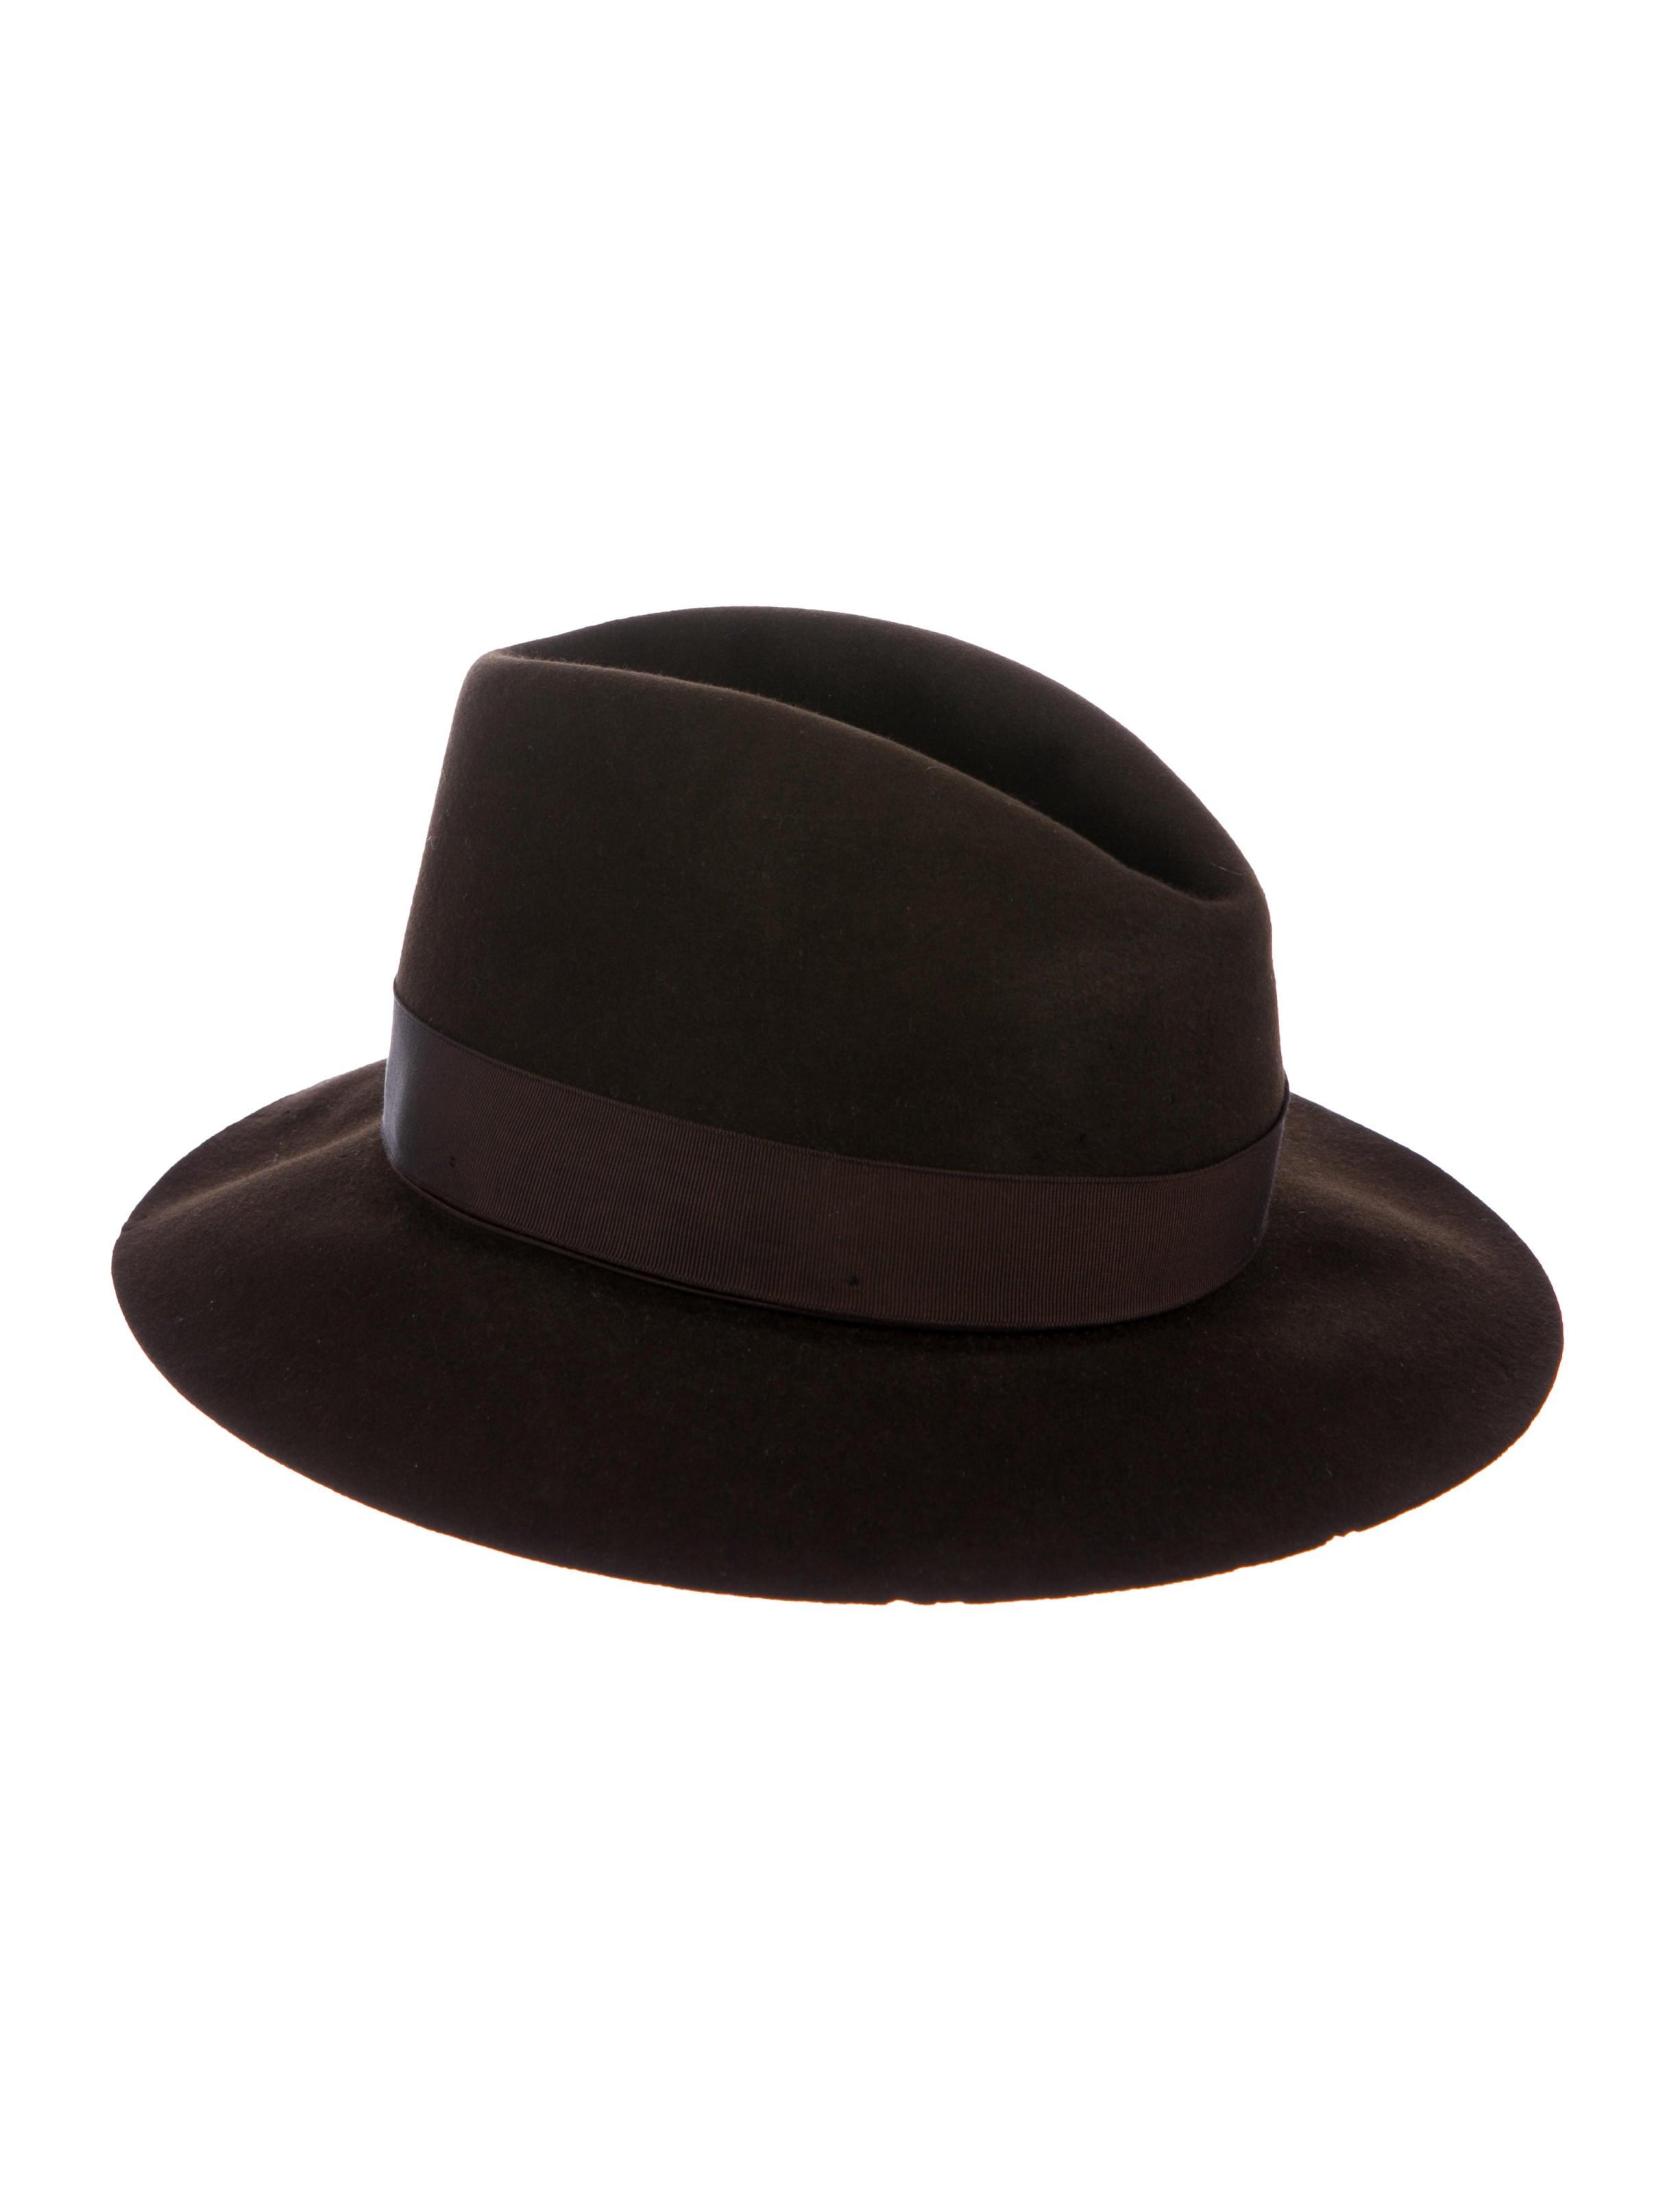 888c94a5a7a Borsalino Alessandria Felt Hat - Accessories - BSL20133